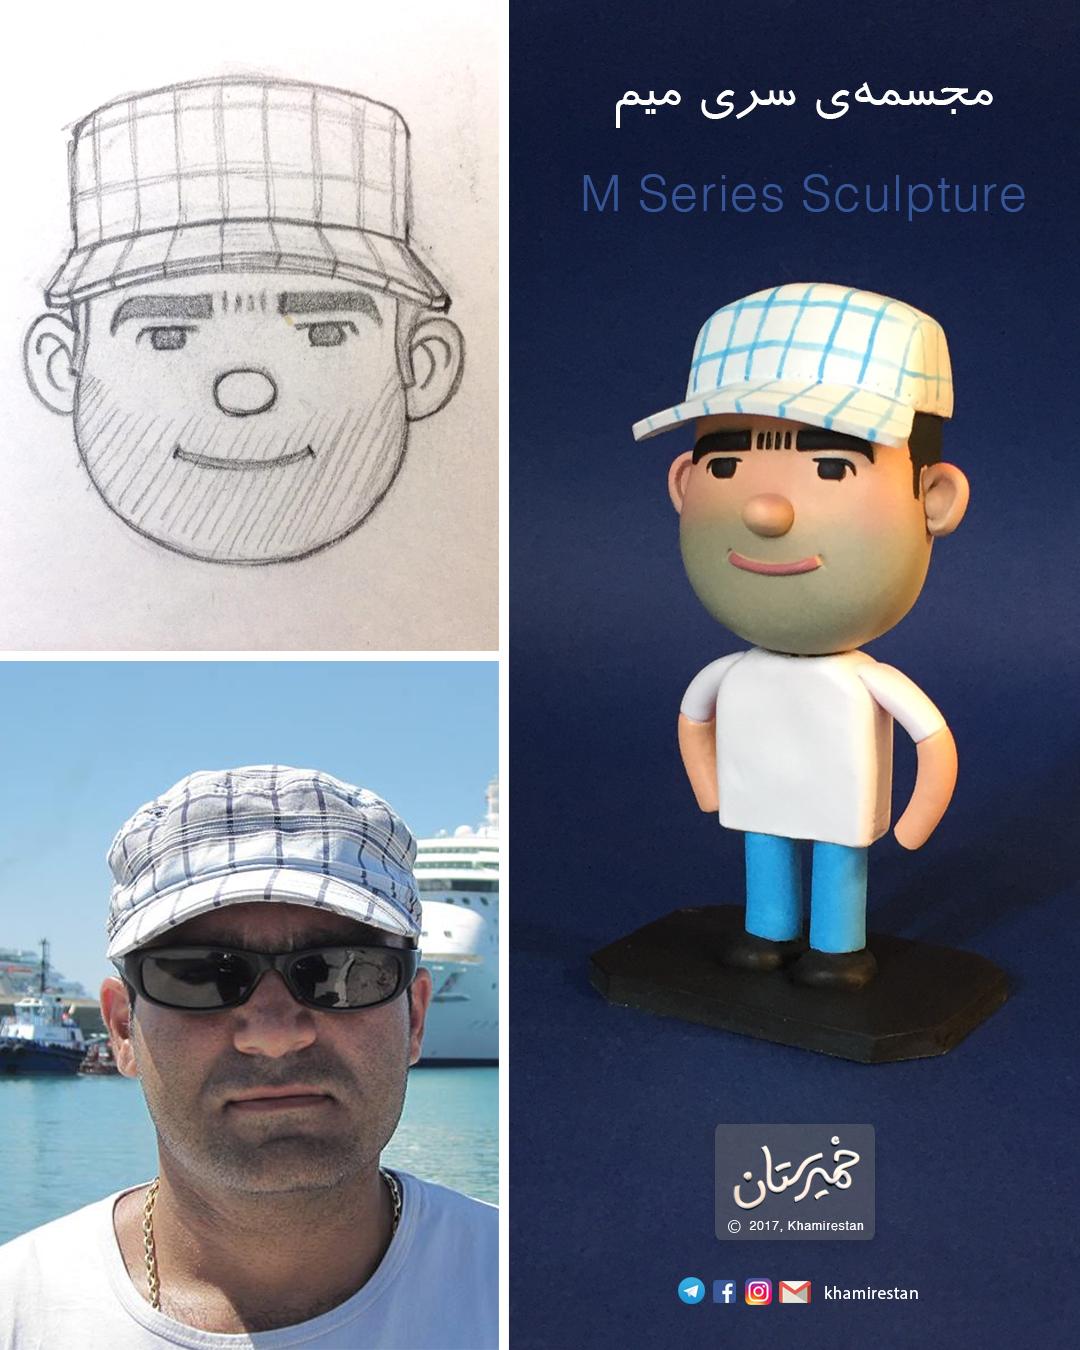 M series sculpture